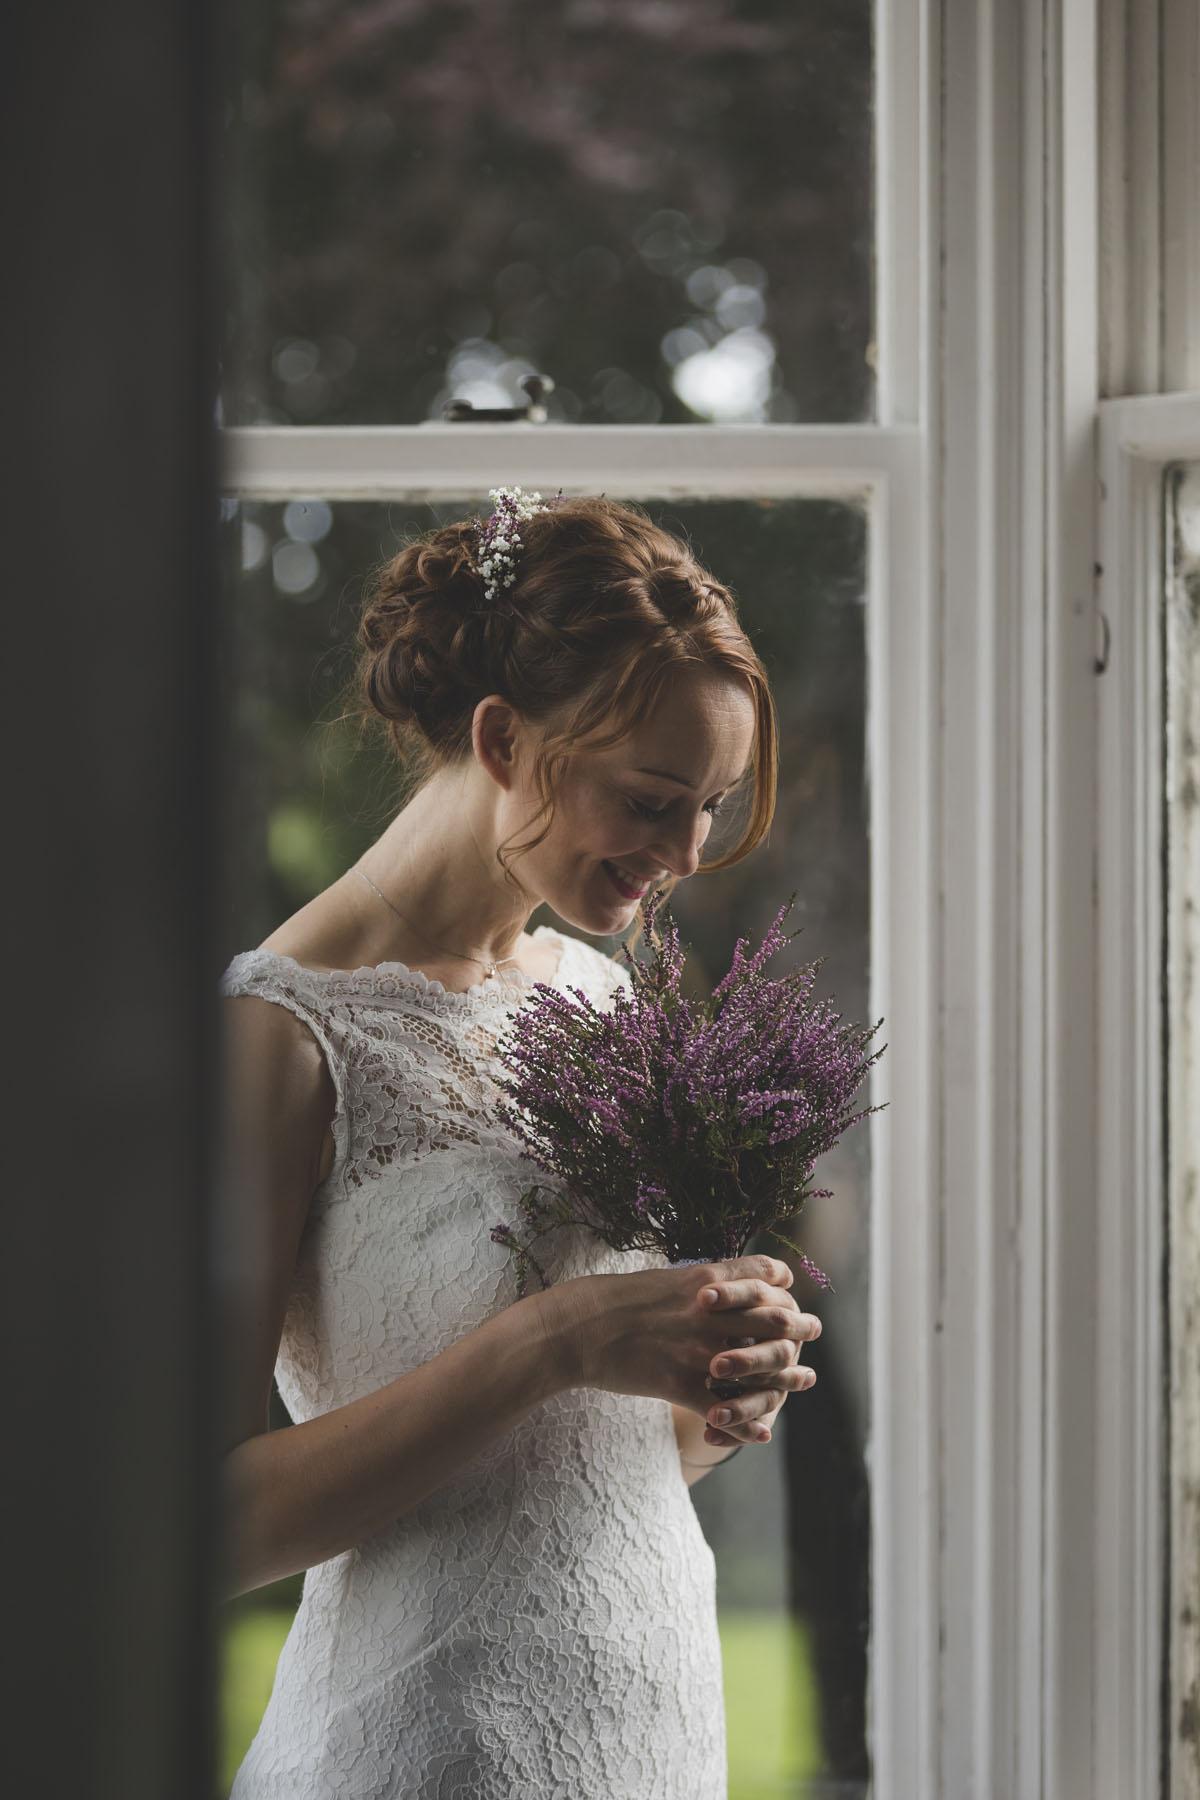 pulmafotod-048-scotland-wedding-photo.jpg